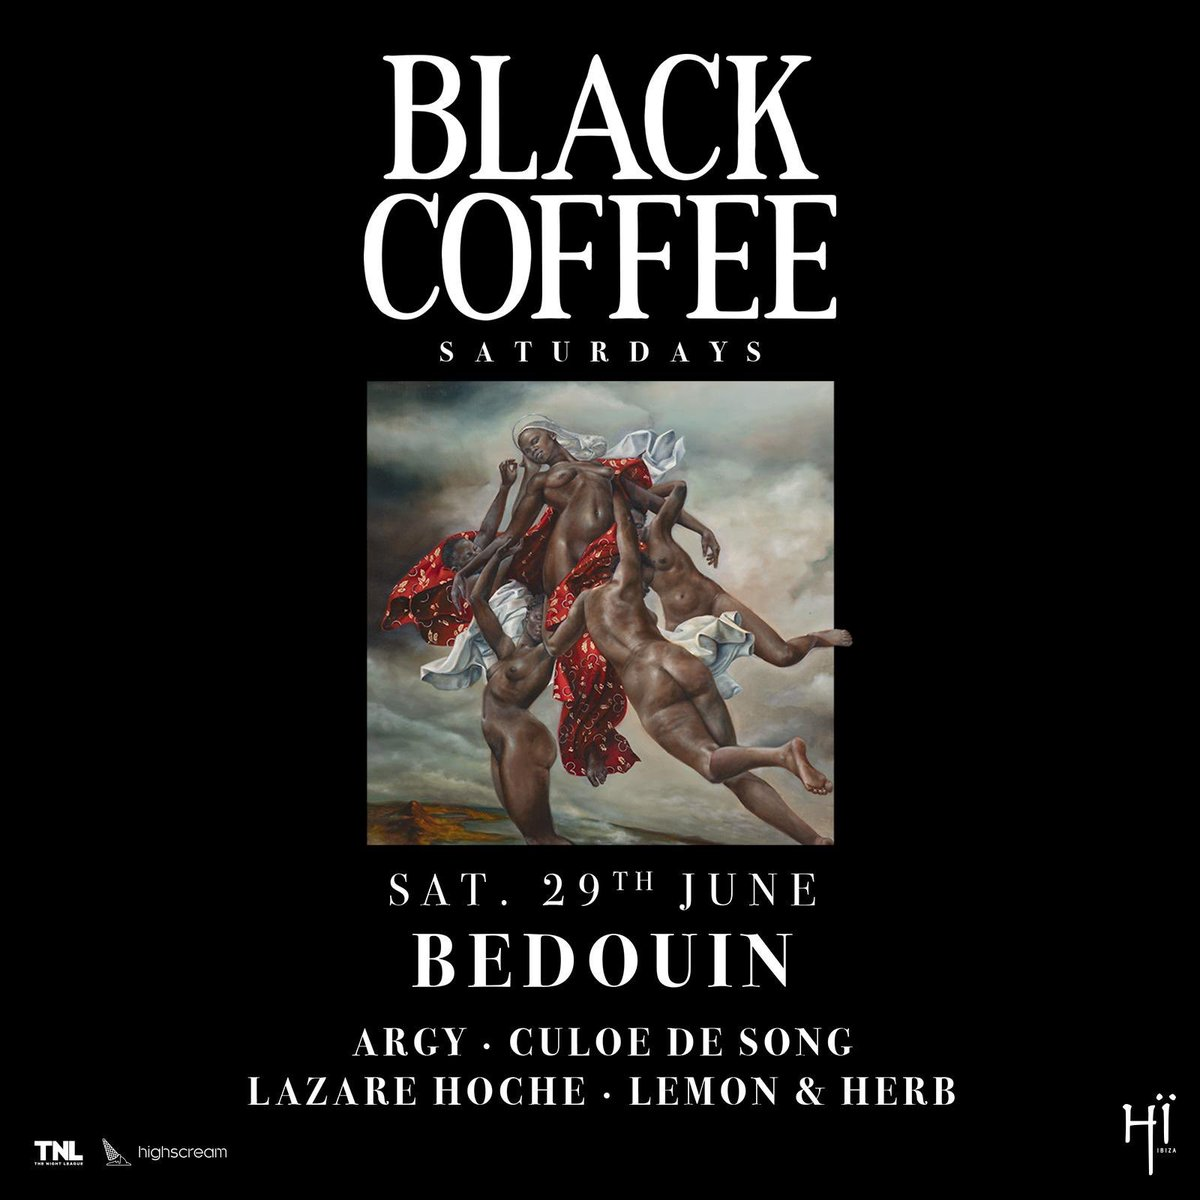 Black Coffee Saturdays in Ibiza